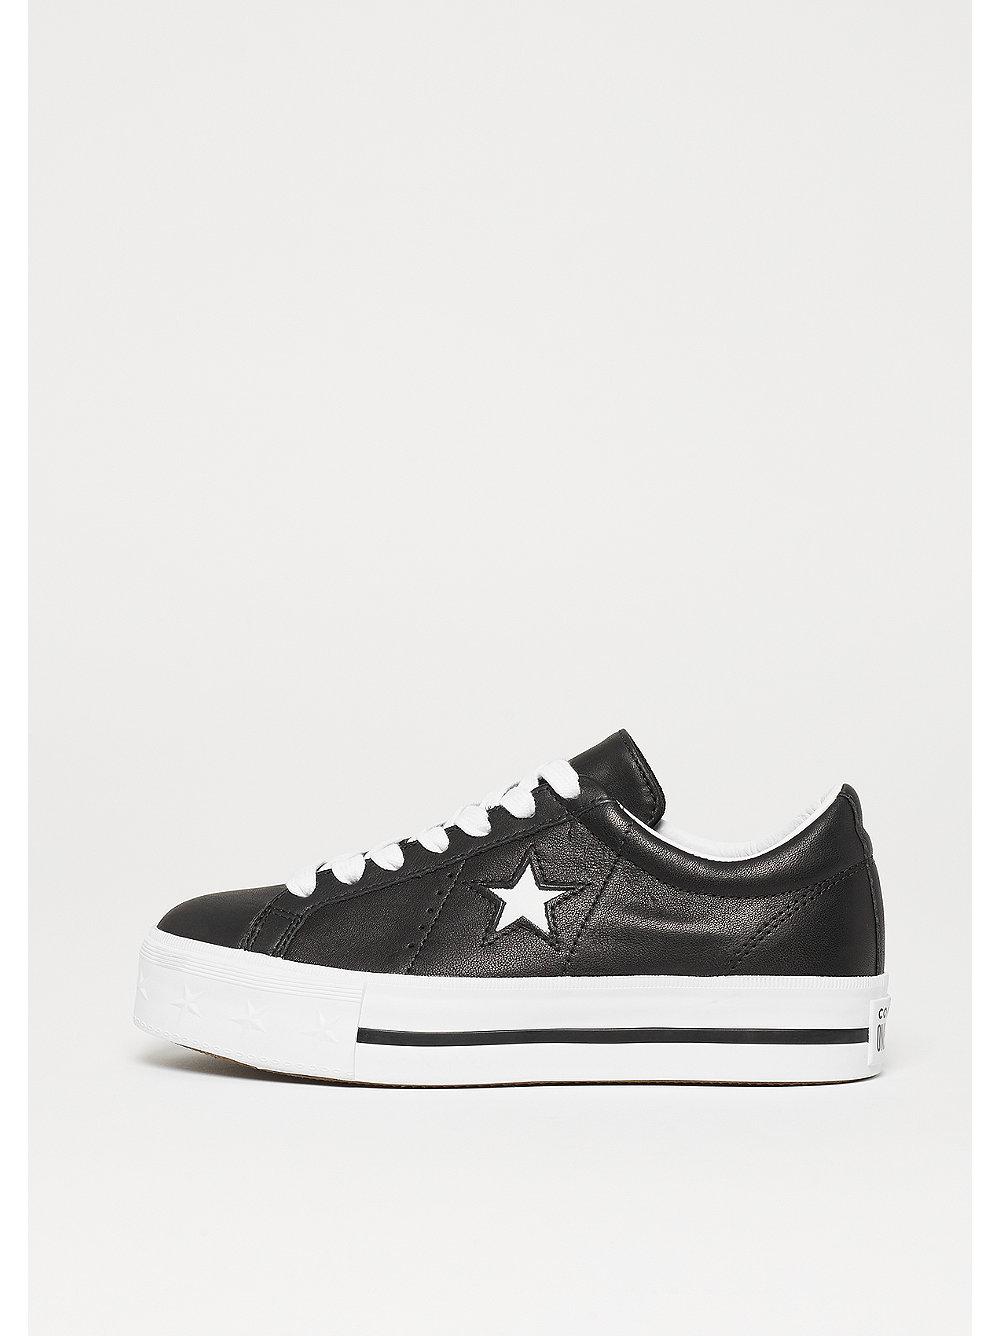 Converse One Star Platform OX black/white/white